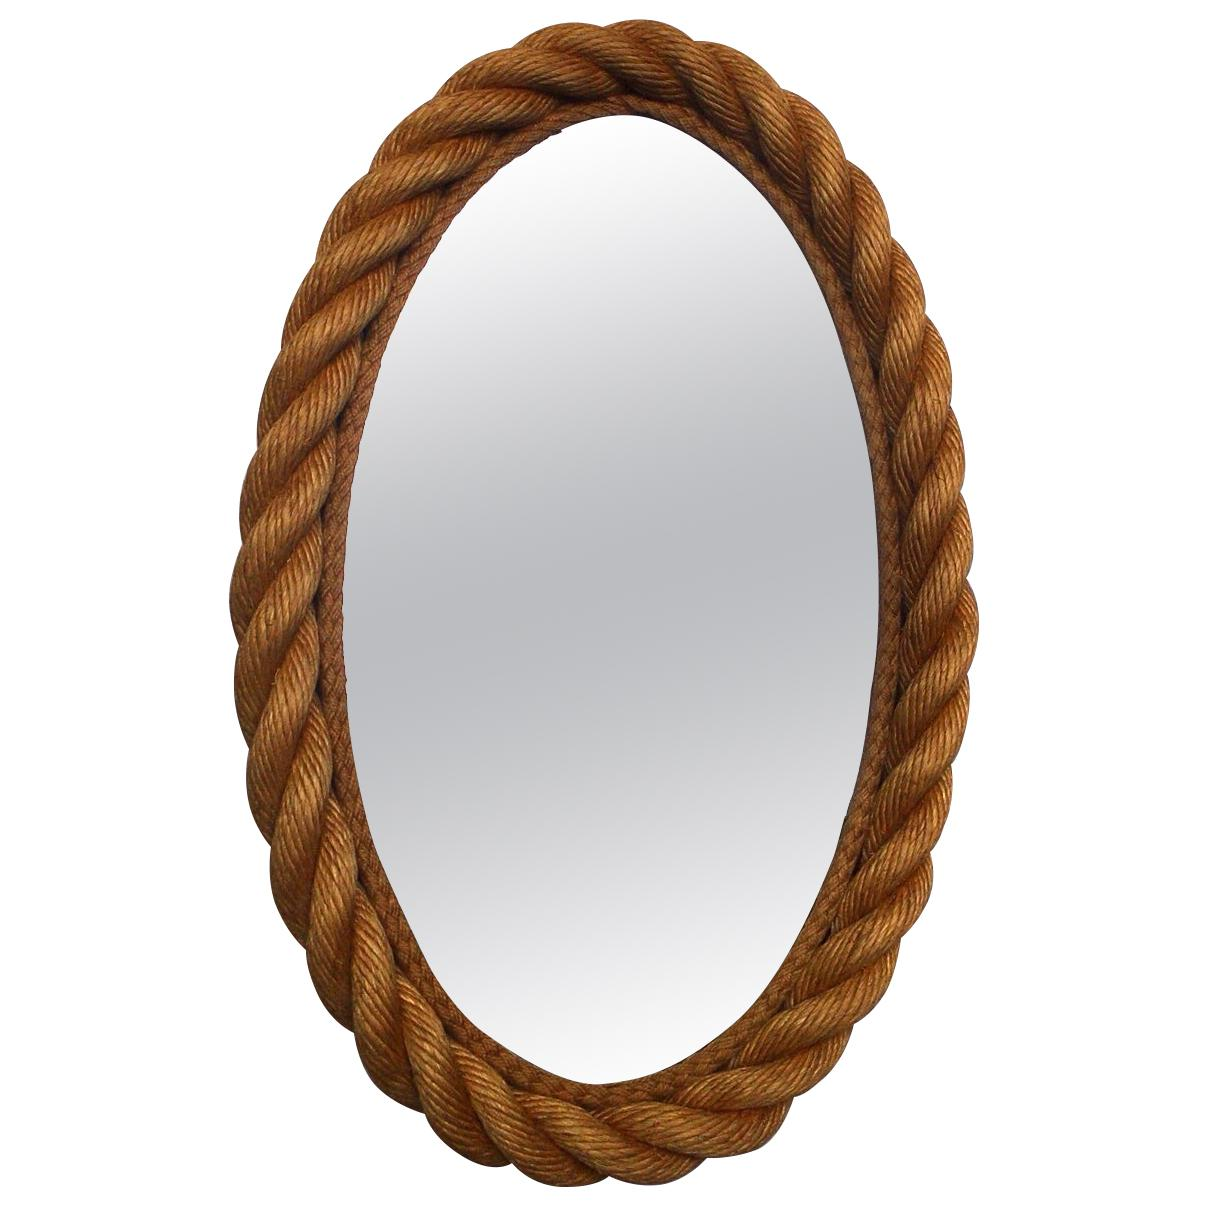 Oval Rope Mirror Audoux Minet, circa 1960